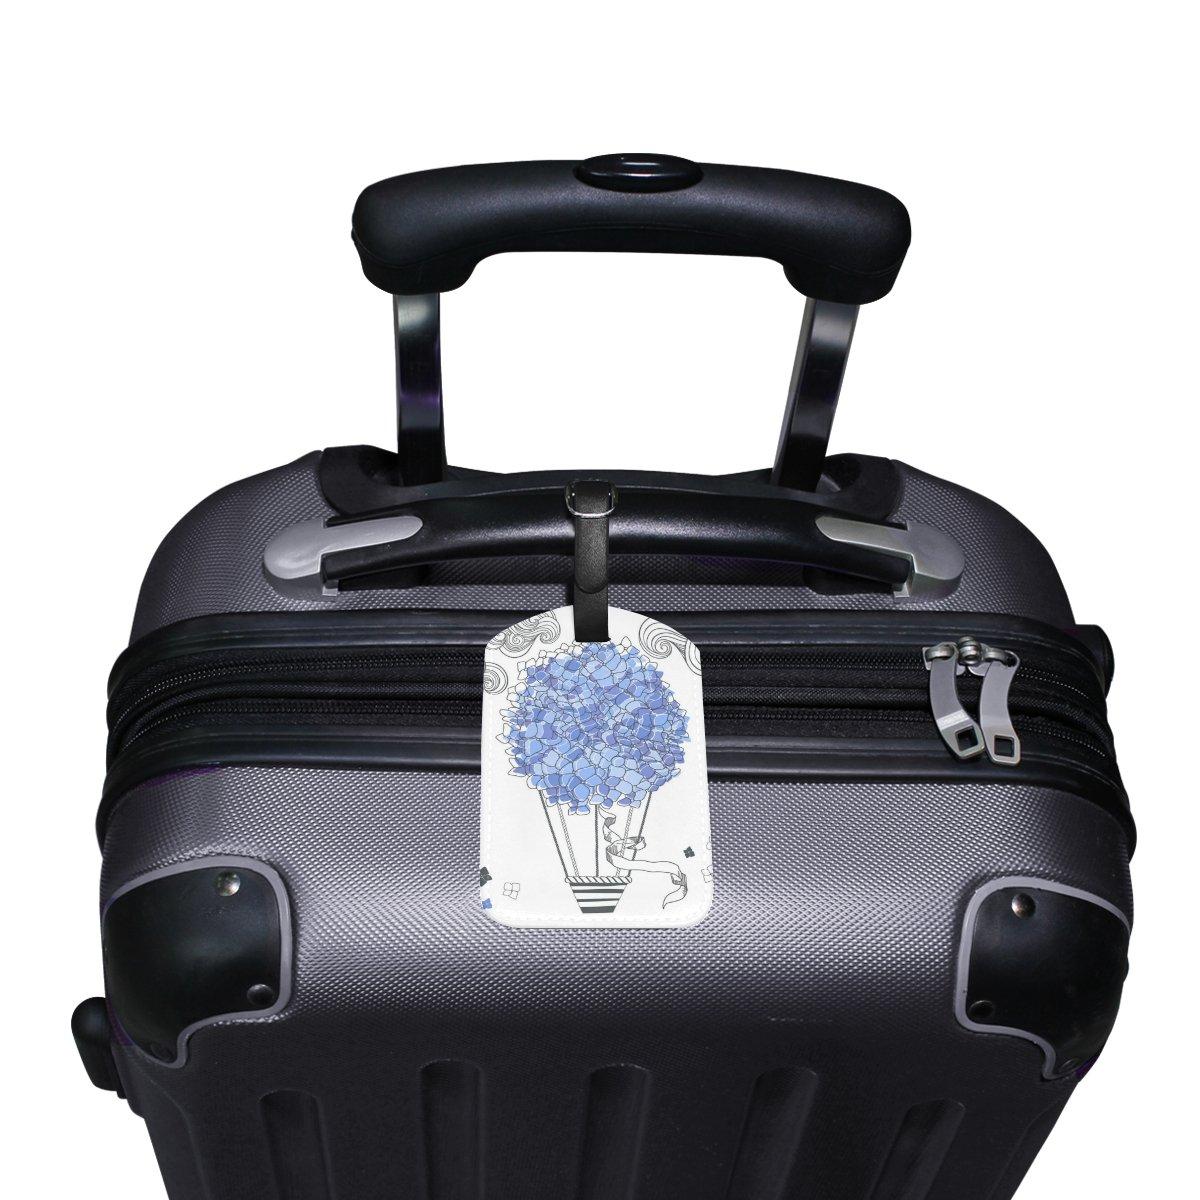 Saobao Travel Luggage Tag Blue Hot Balloon PU Leather Baggage Travel ID